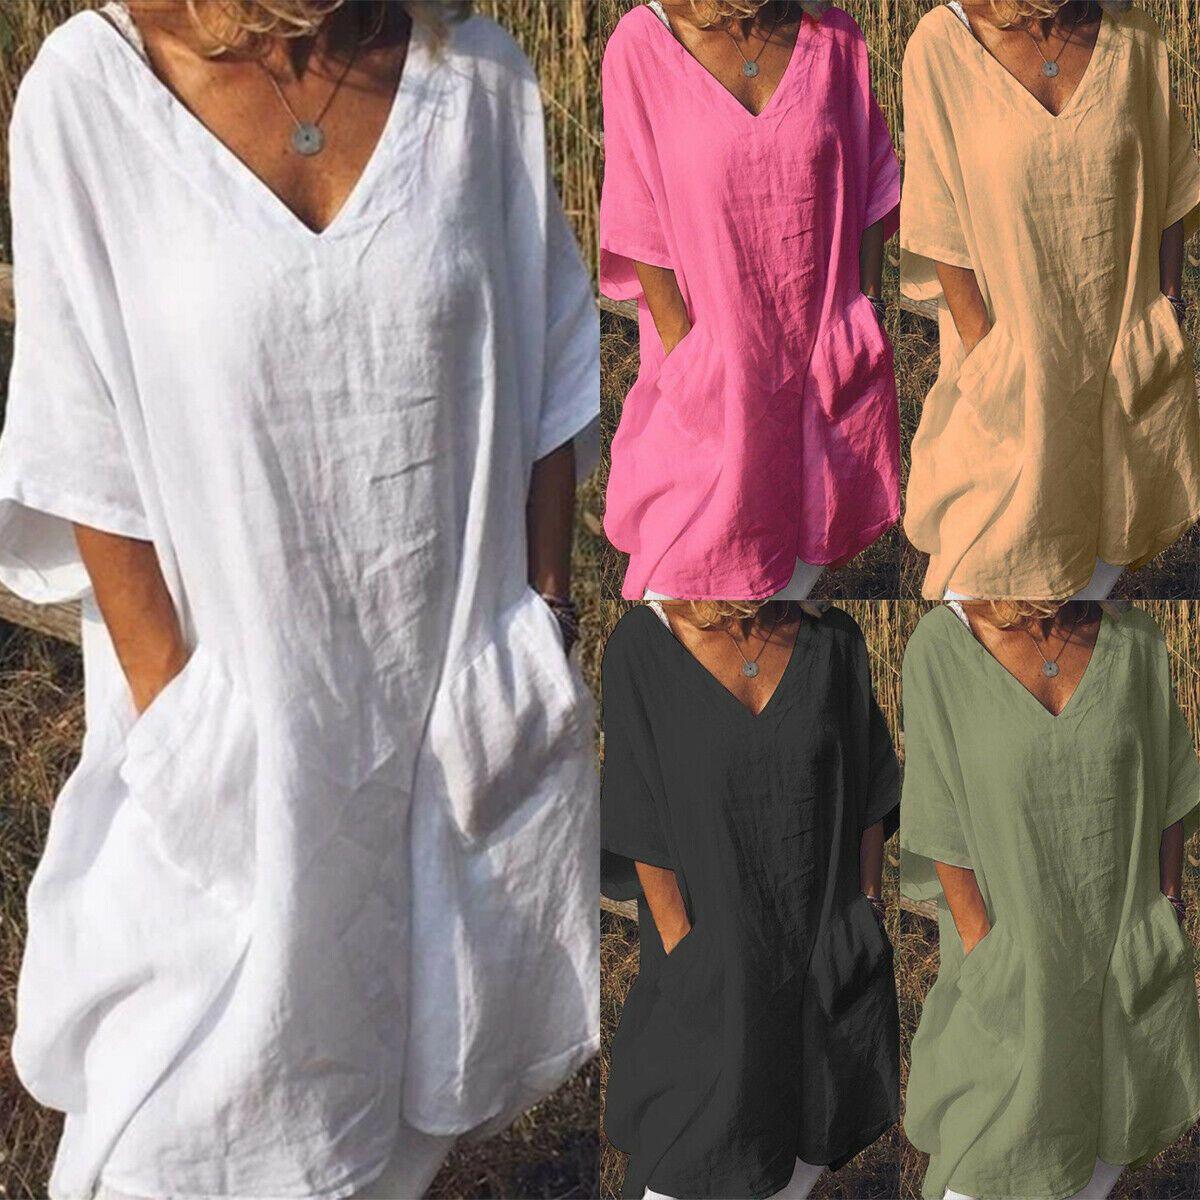 Übergröße Damen Longshirt Tunika Minikleid Sommer Shiftkleid Hemdkleid Longtop